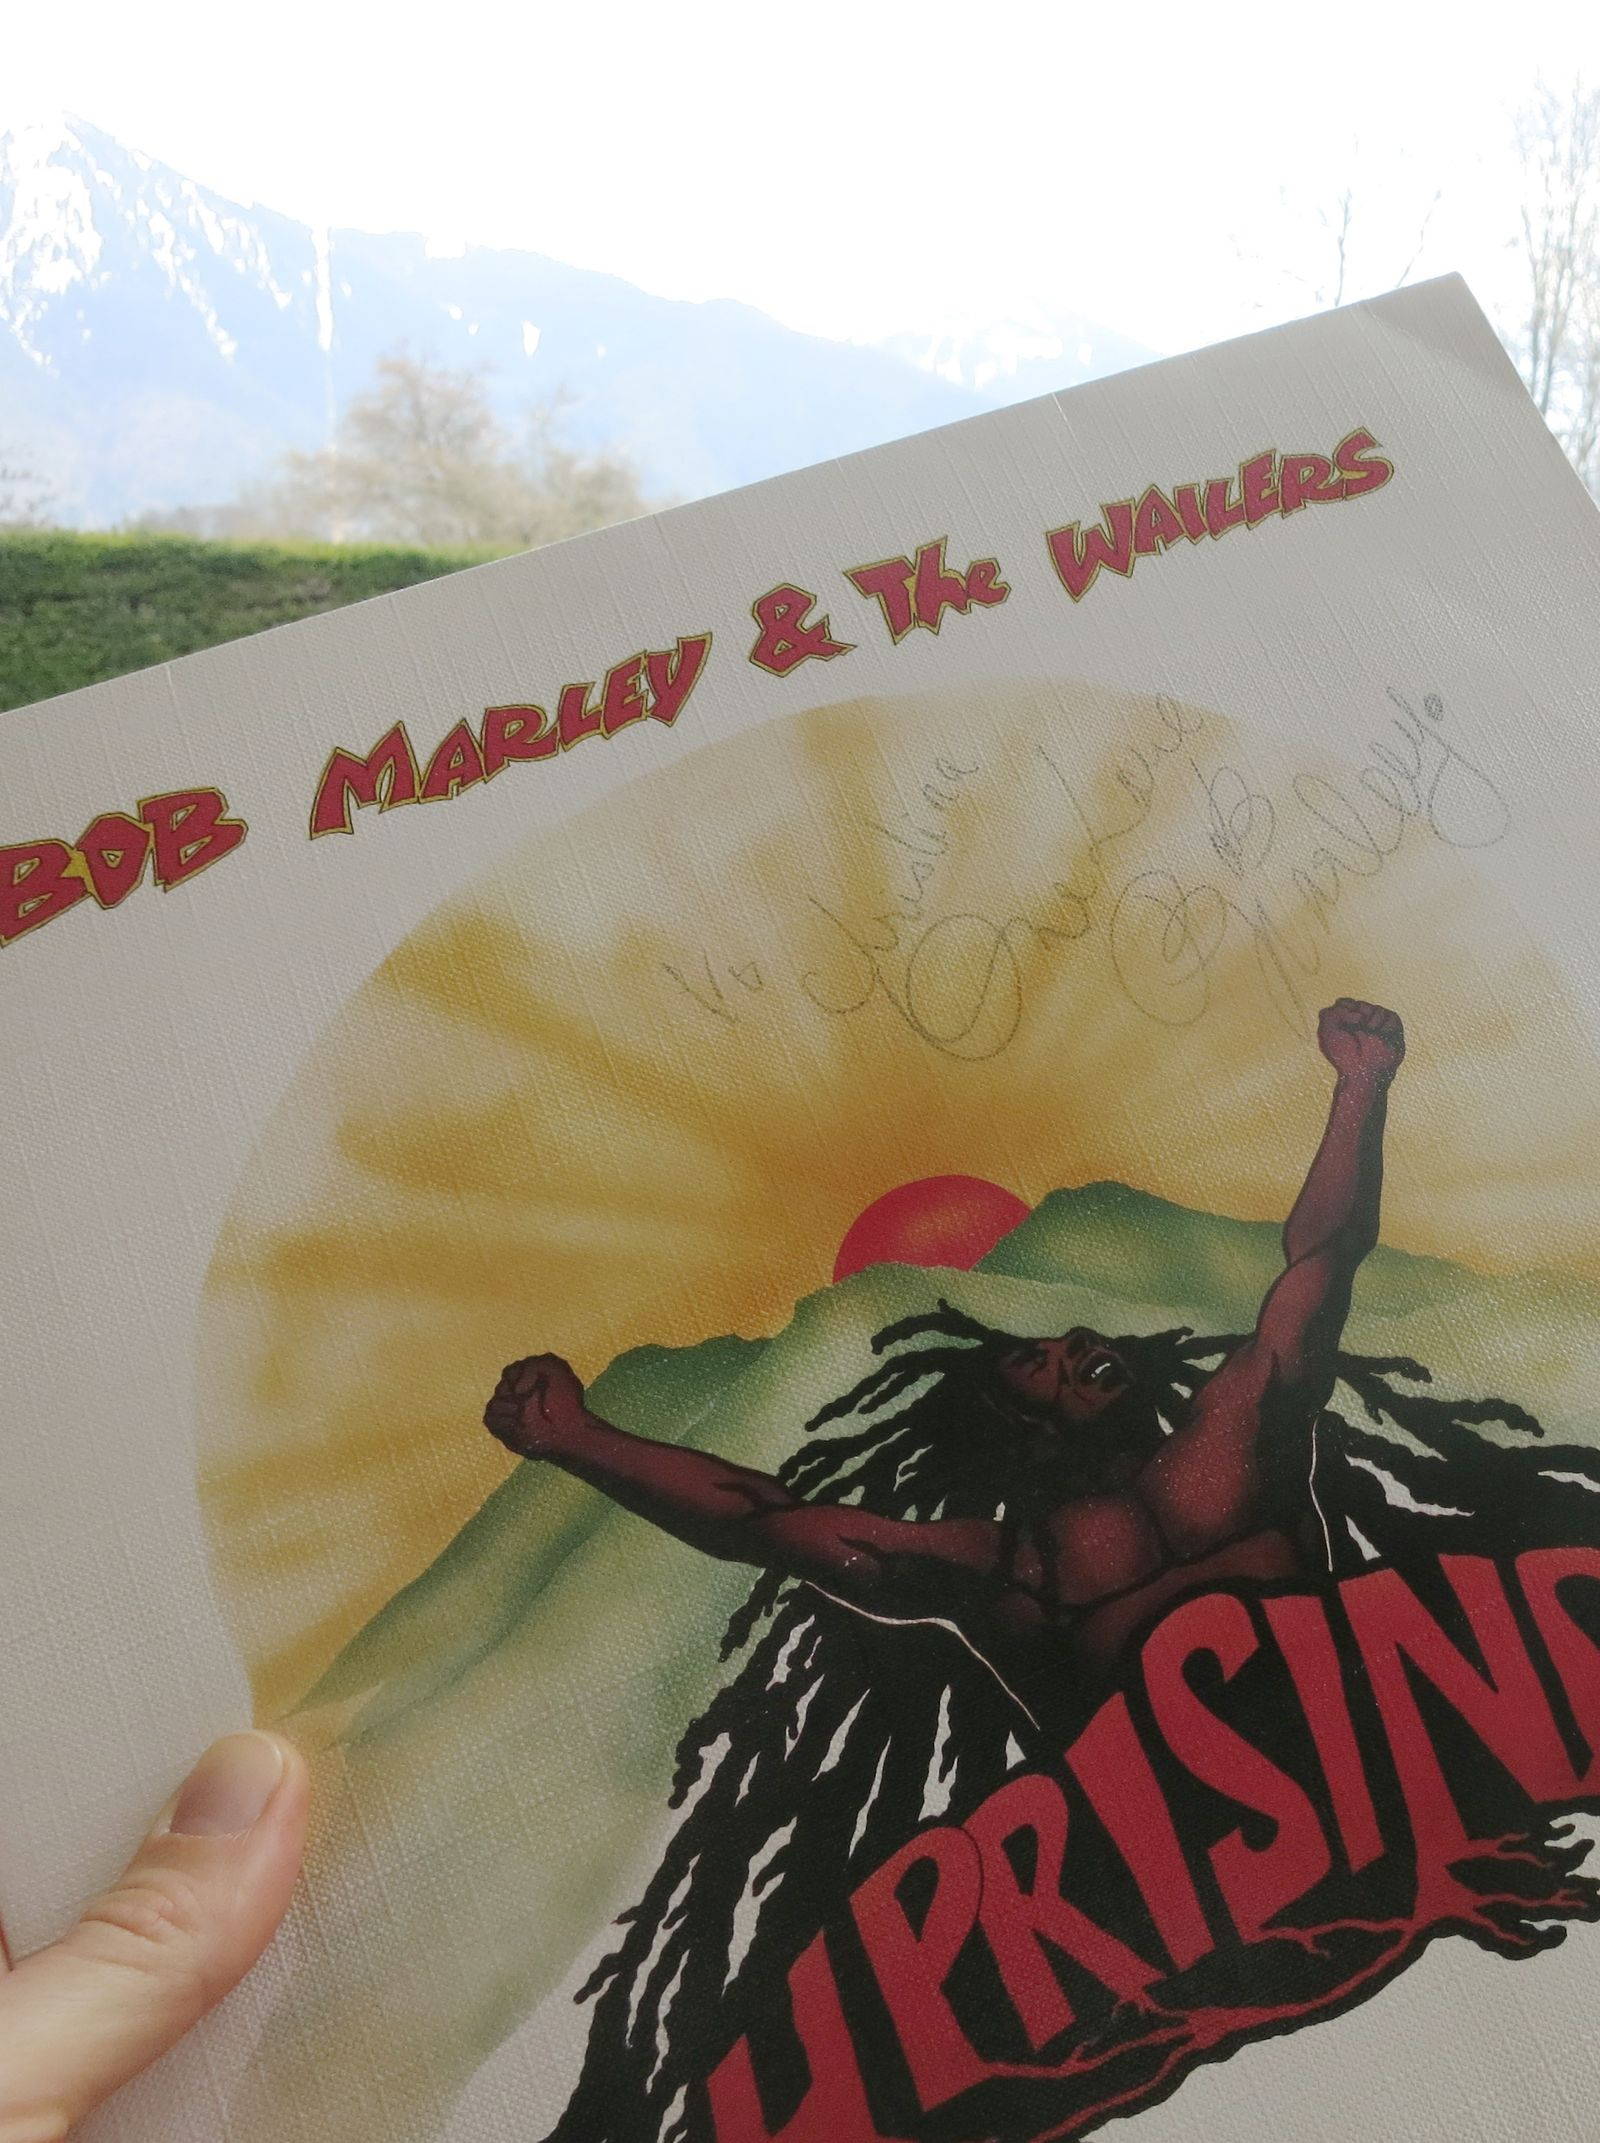 To Christina One Love Bob Marley Signiertes Uprising-Album ©Stephan Kroener zugeschnitten_